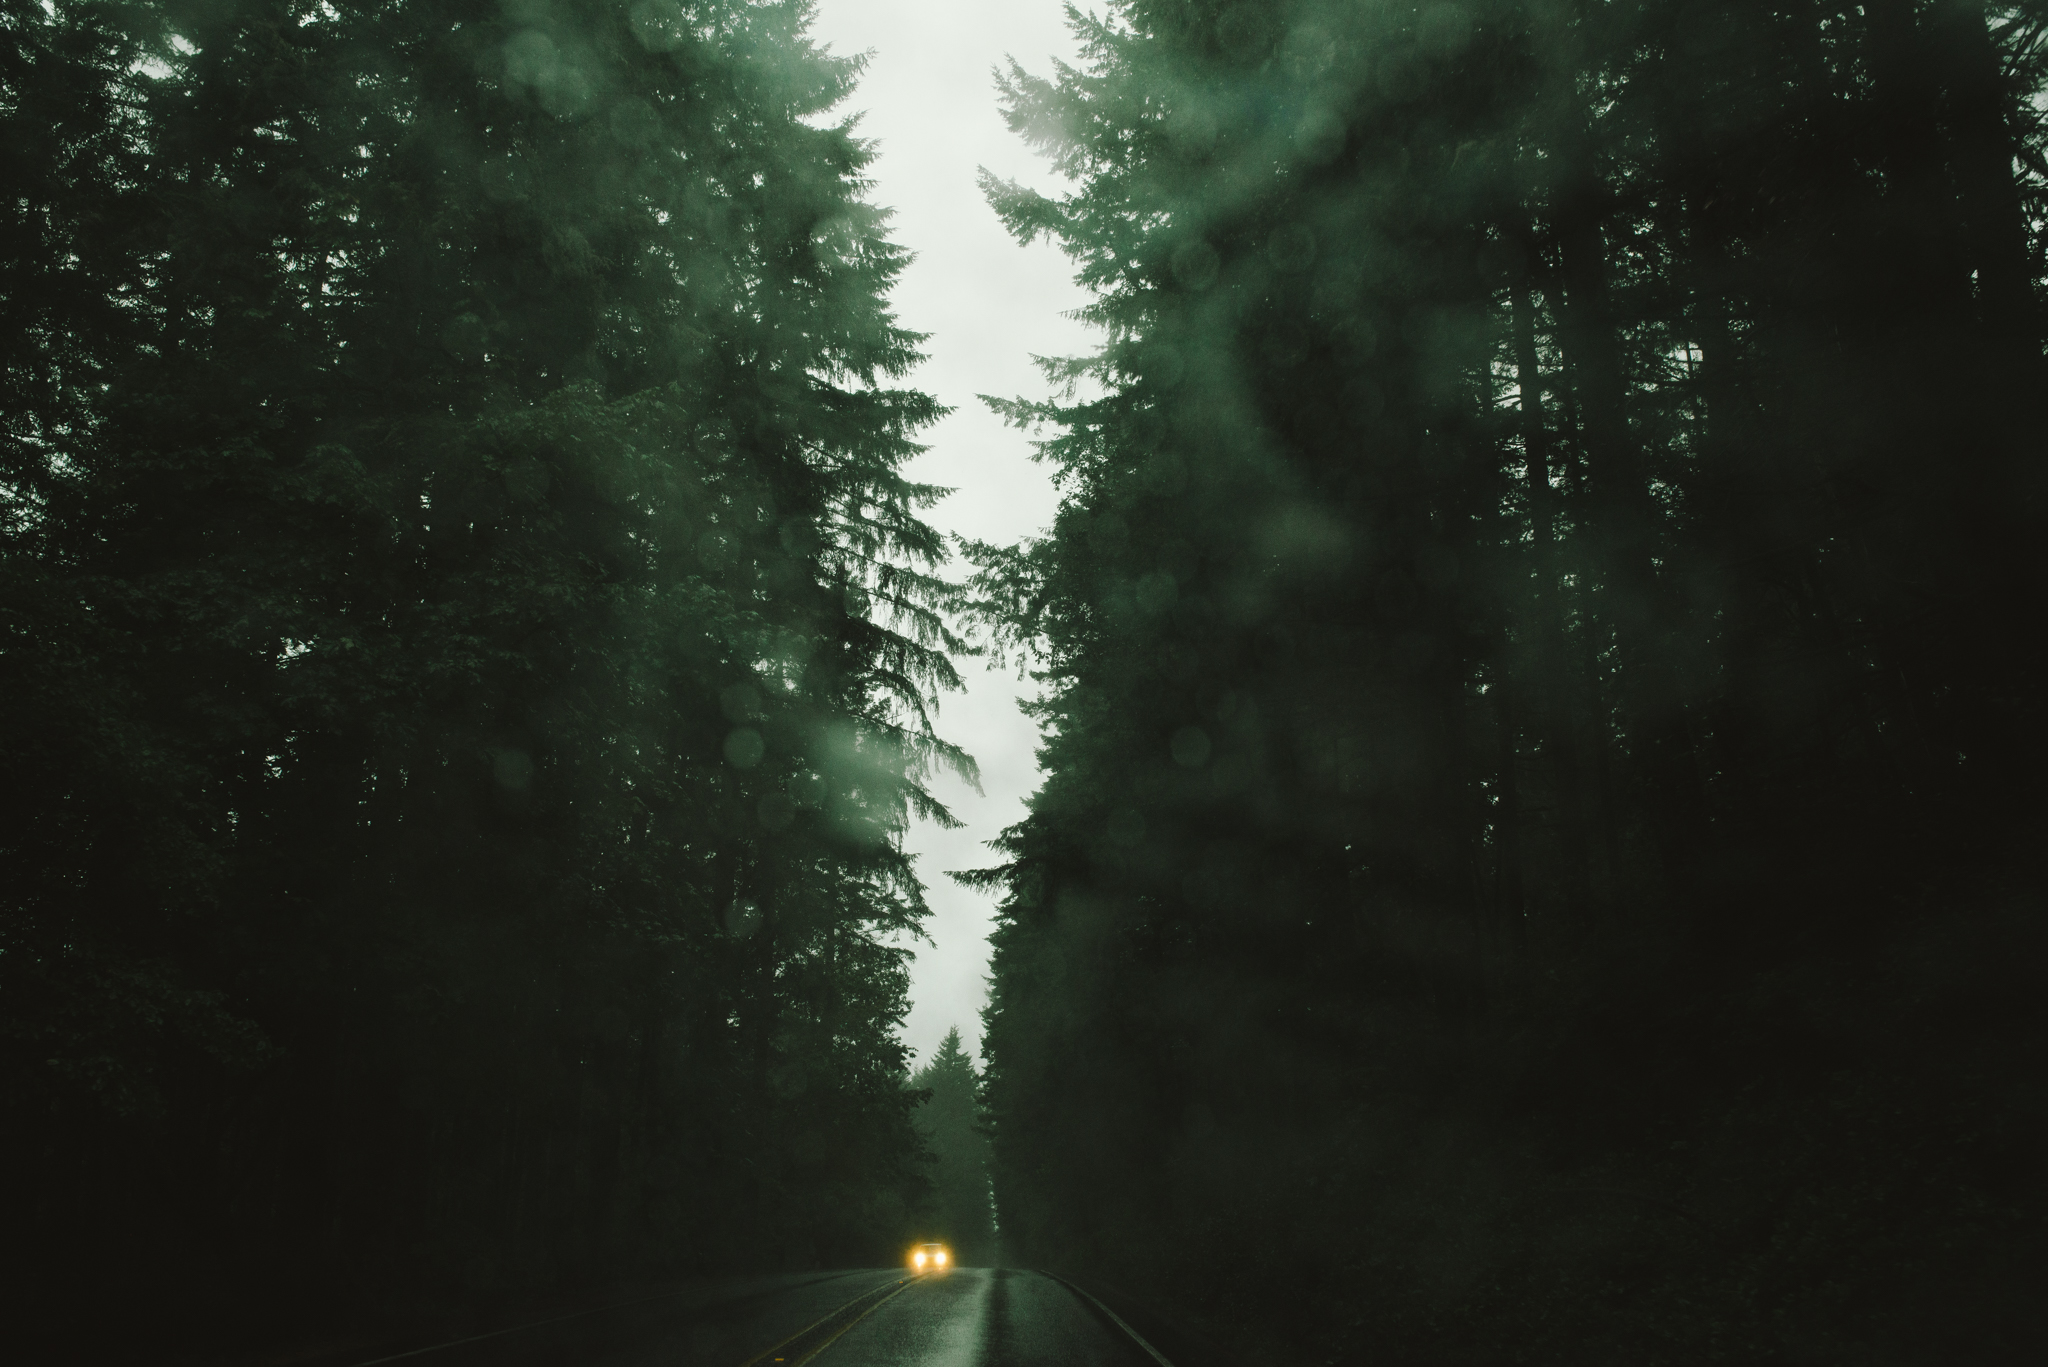 The Ryans Photography - Washington Drizzling Camping Adventure-008.jpg